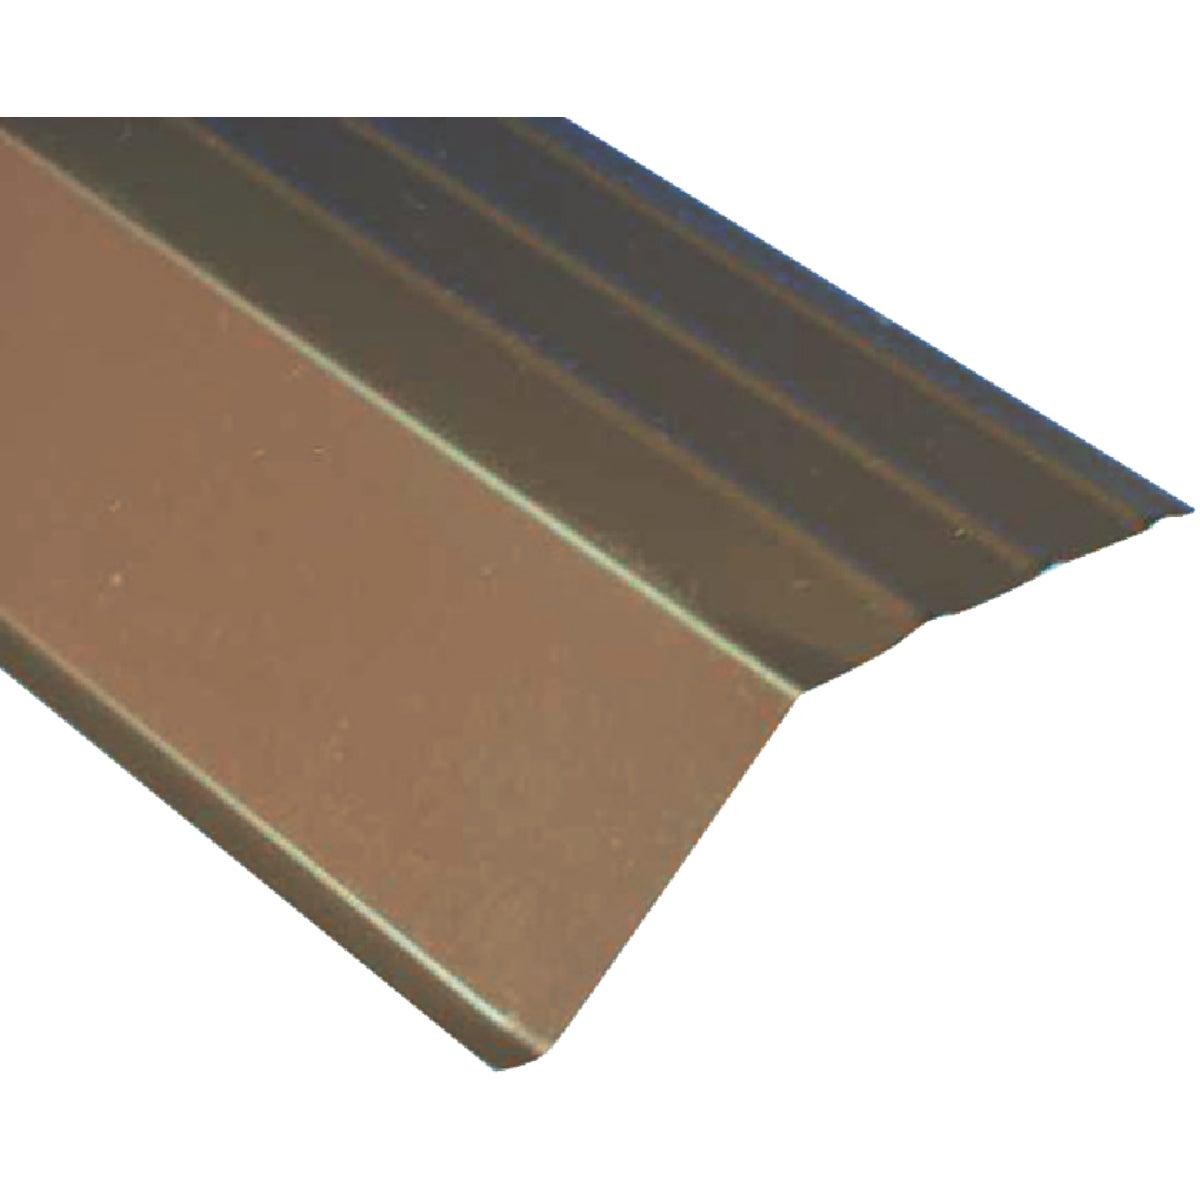 Roof & Drip Edge Flashing